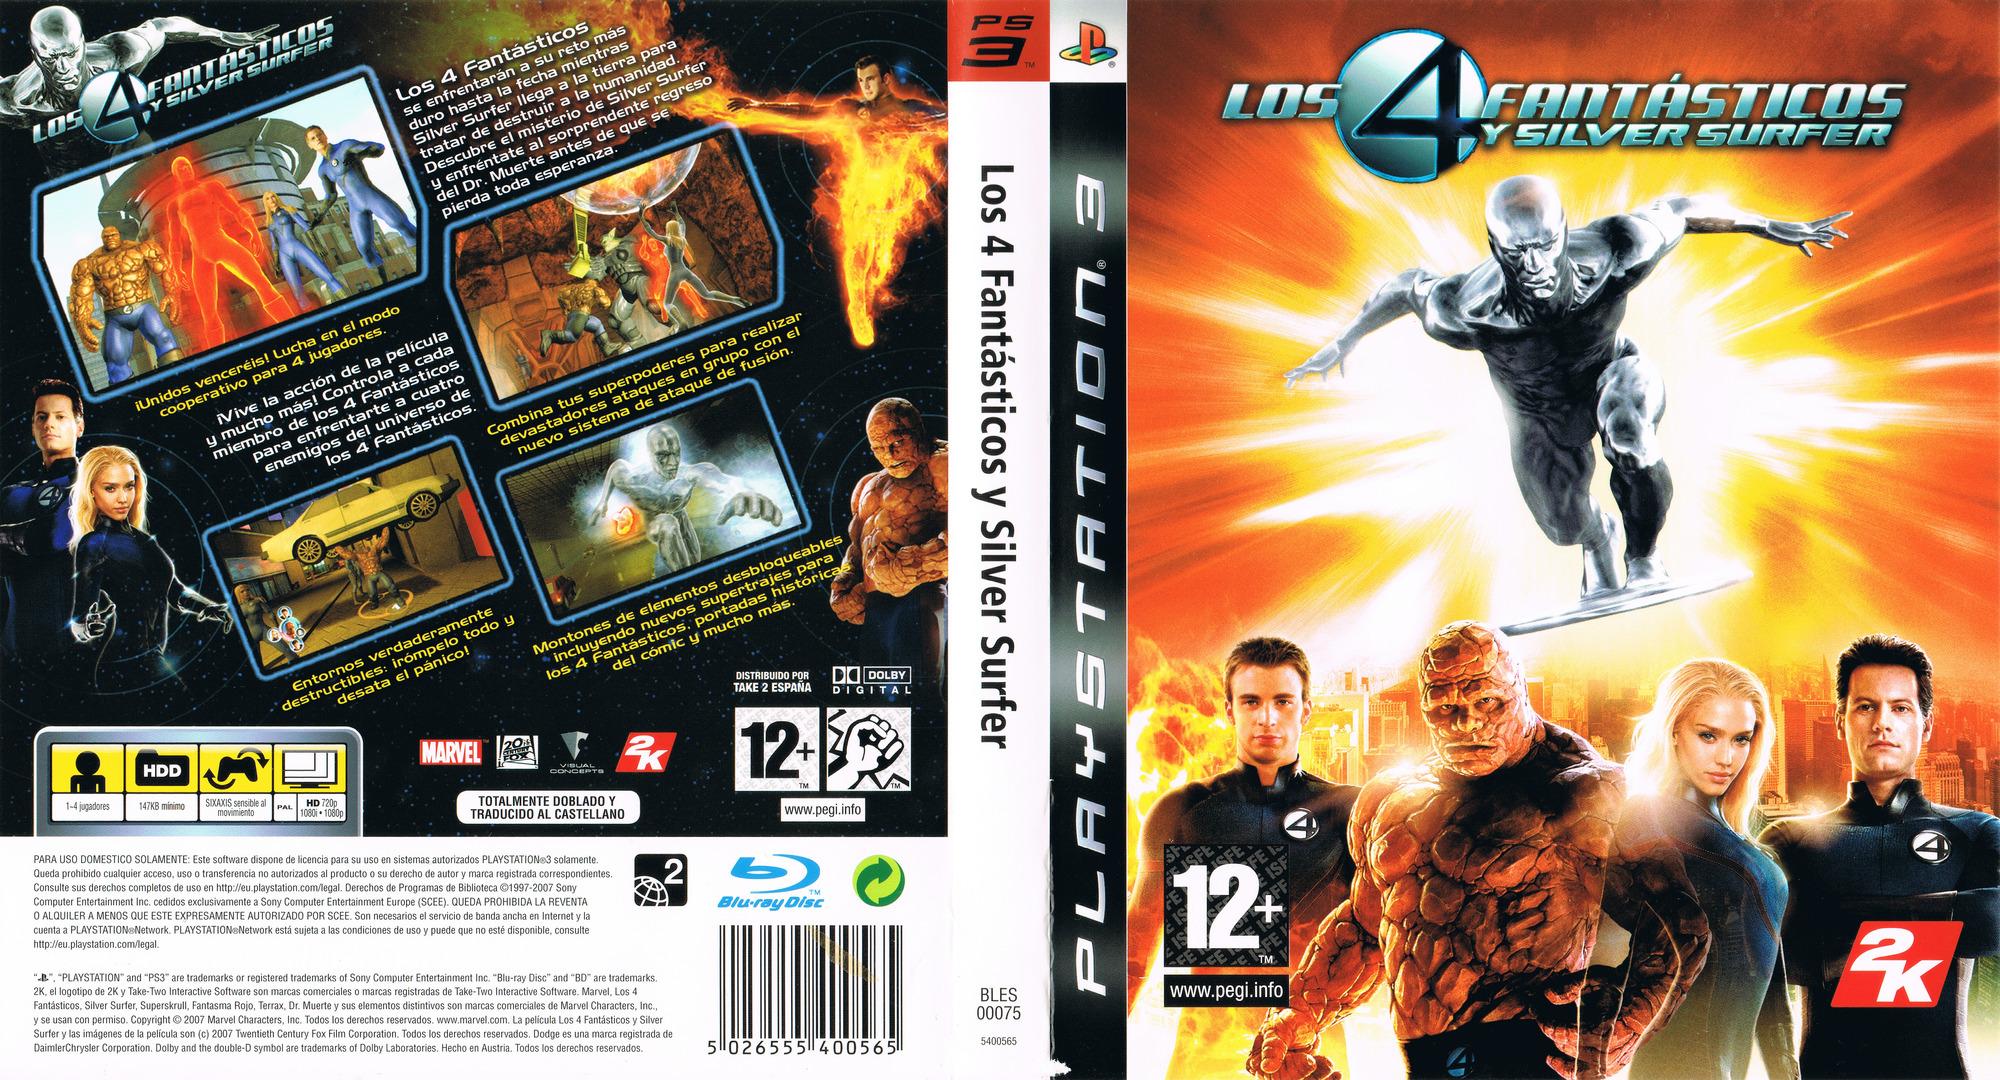 Los 4 Fantásticos y Silver Surfer PS3 coverfullHQ (BLES00075)